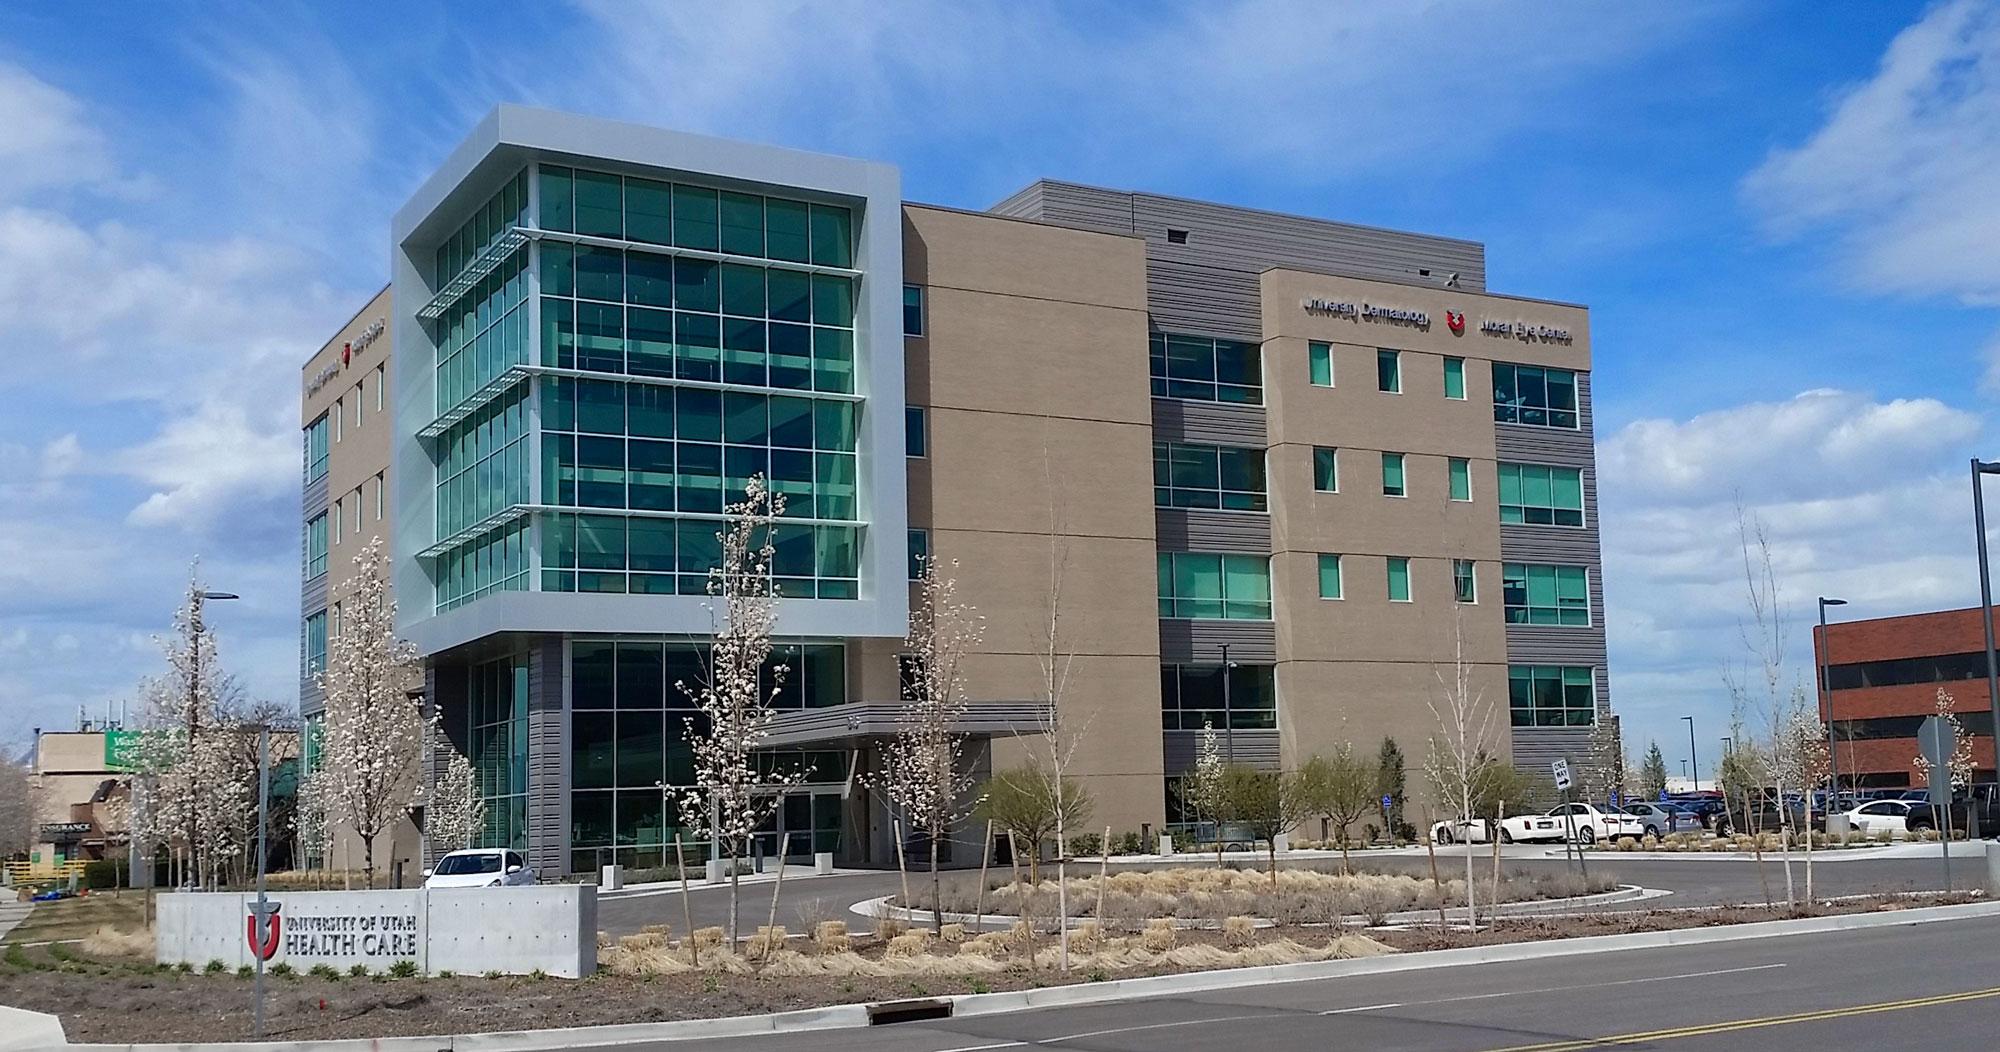 Midvalley Health Center